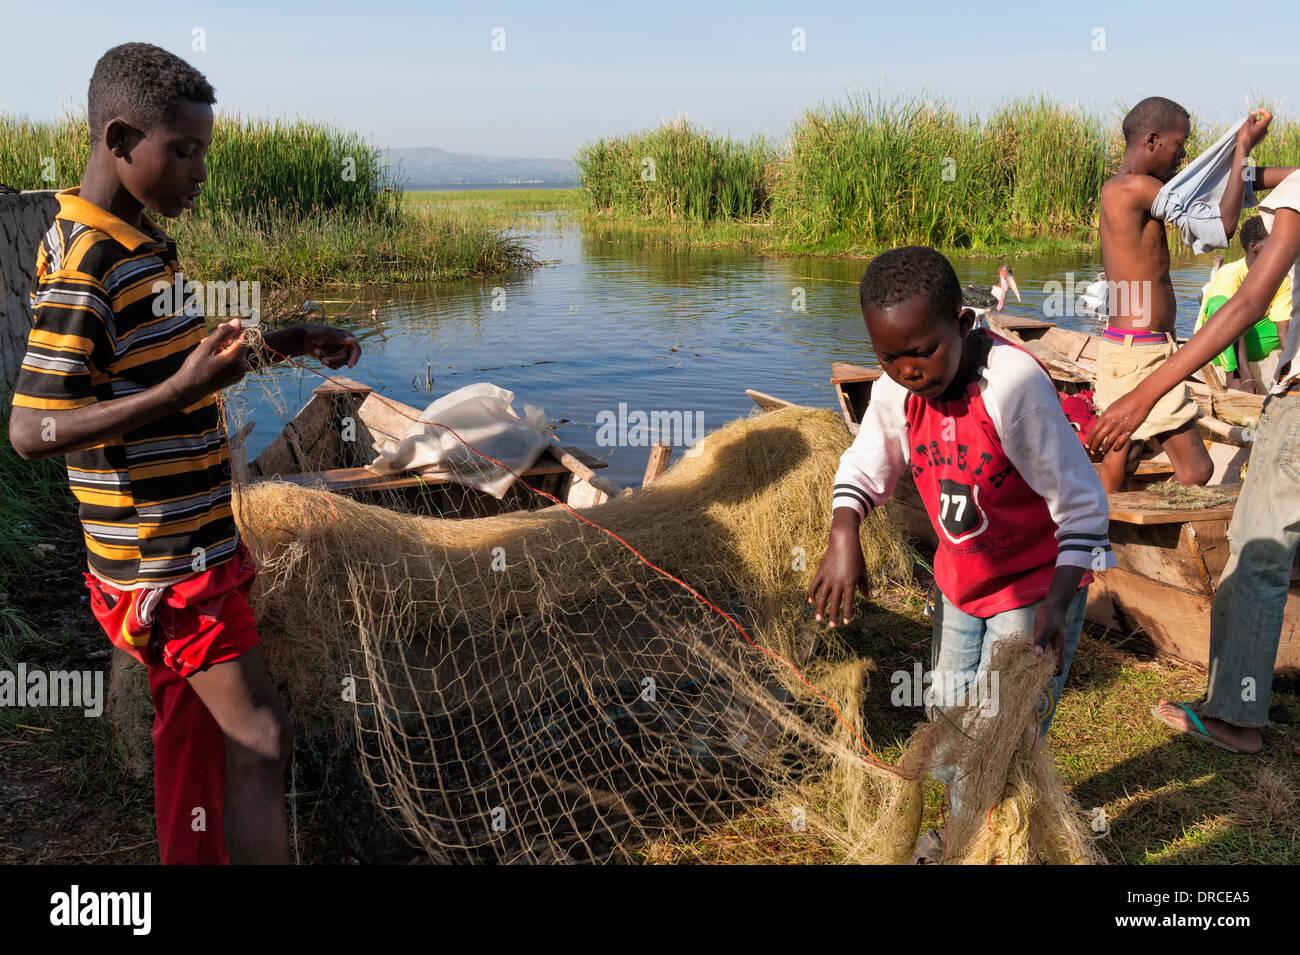 Boys preparing fishing nets, Awasa, Ethiopia - Stock Image